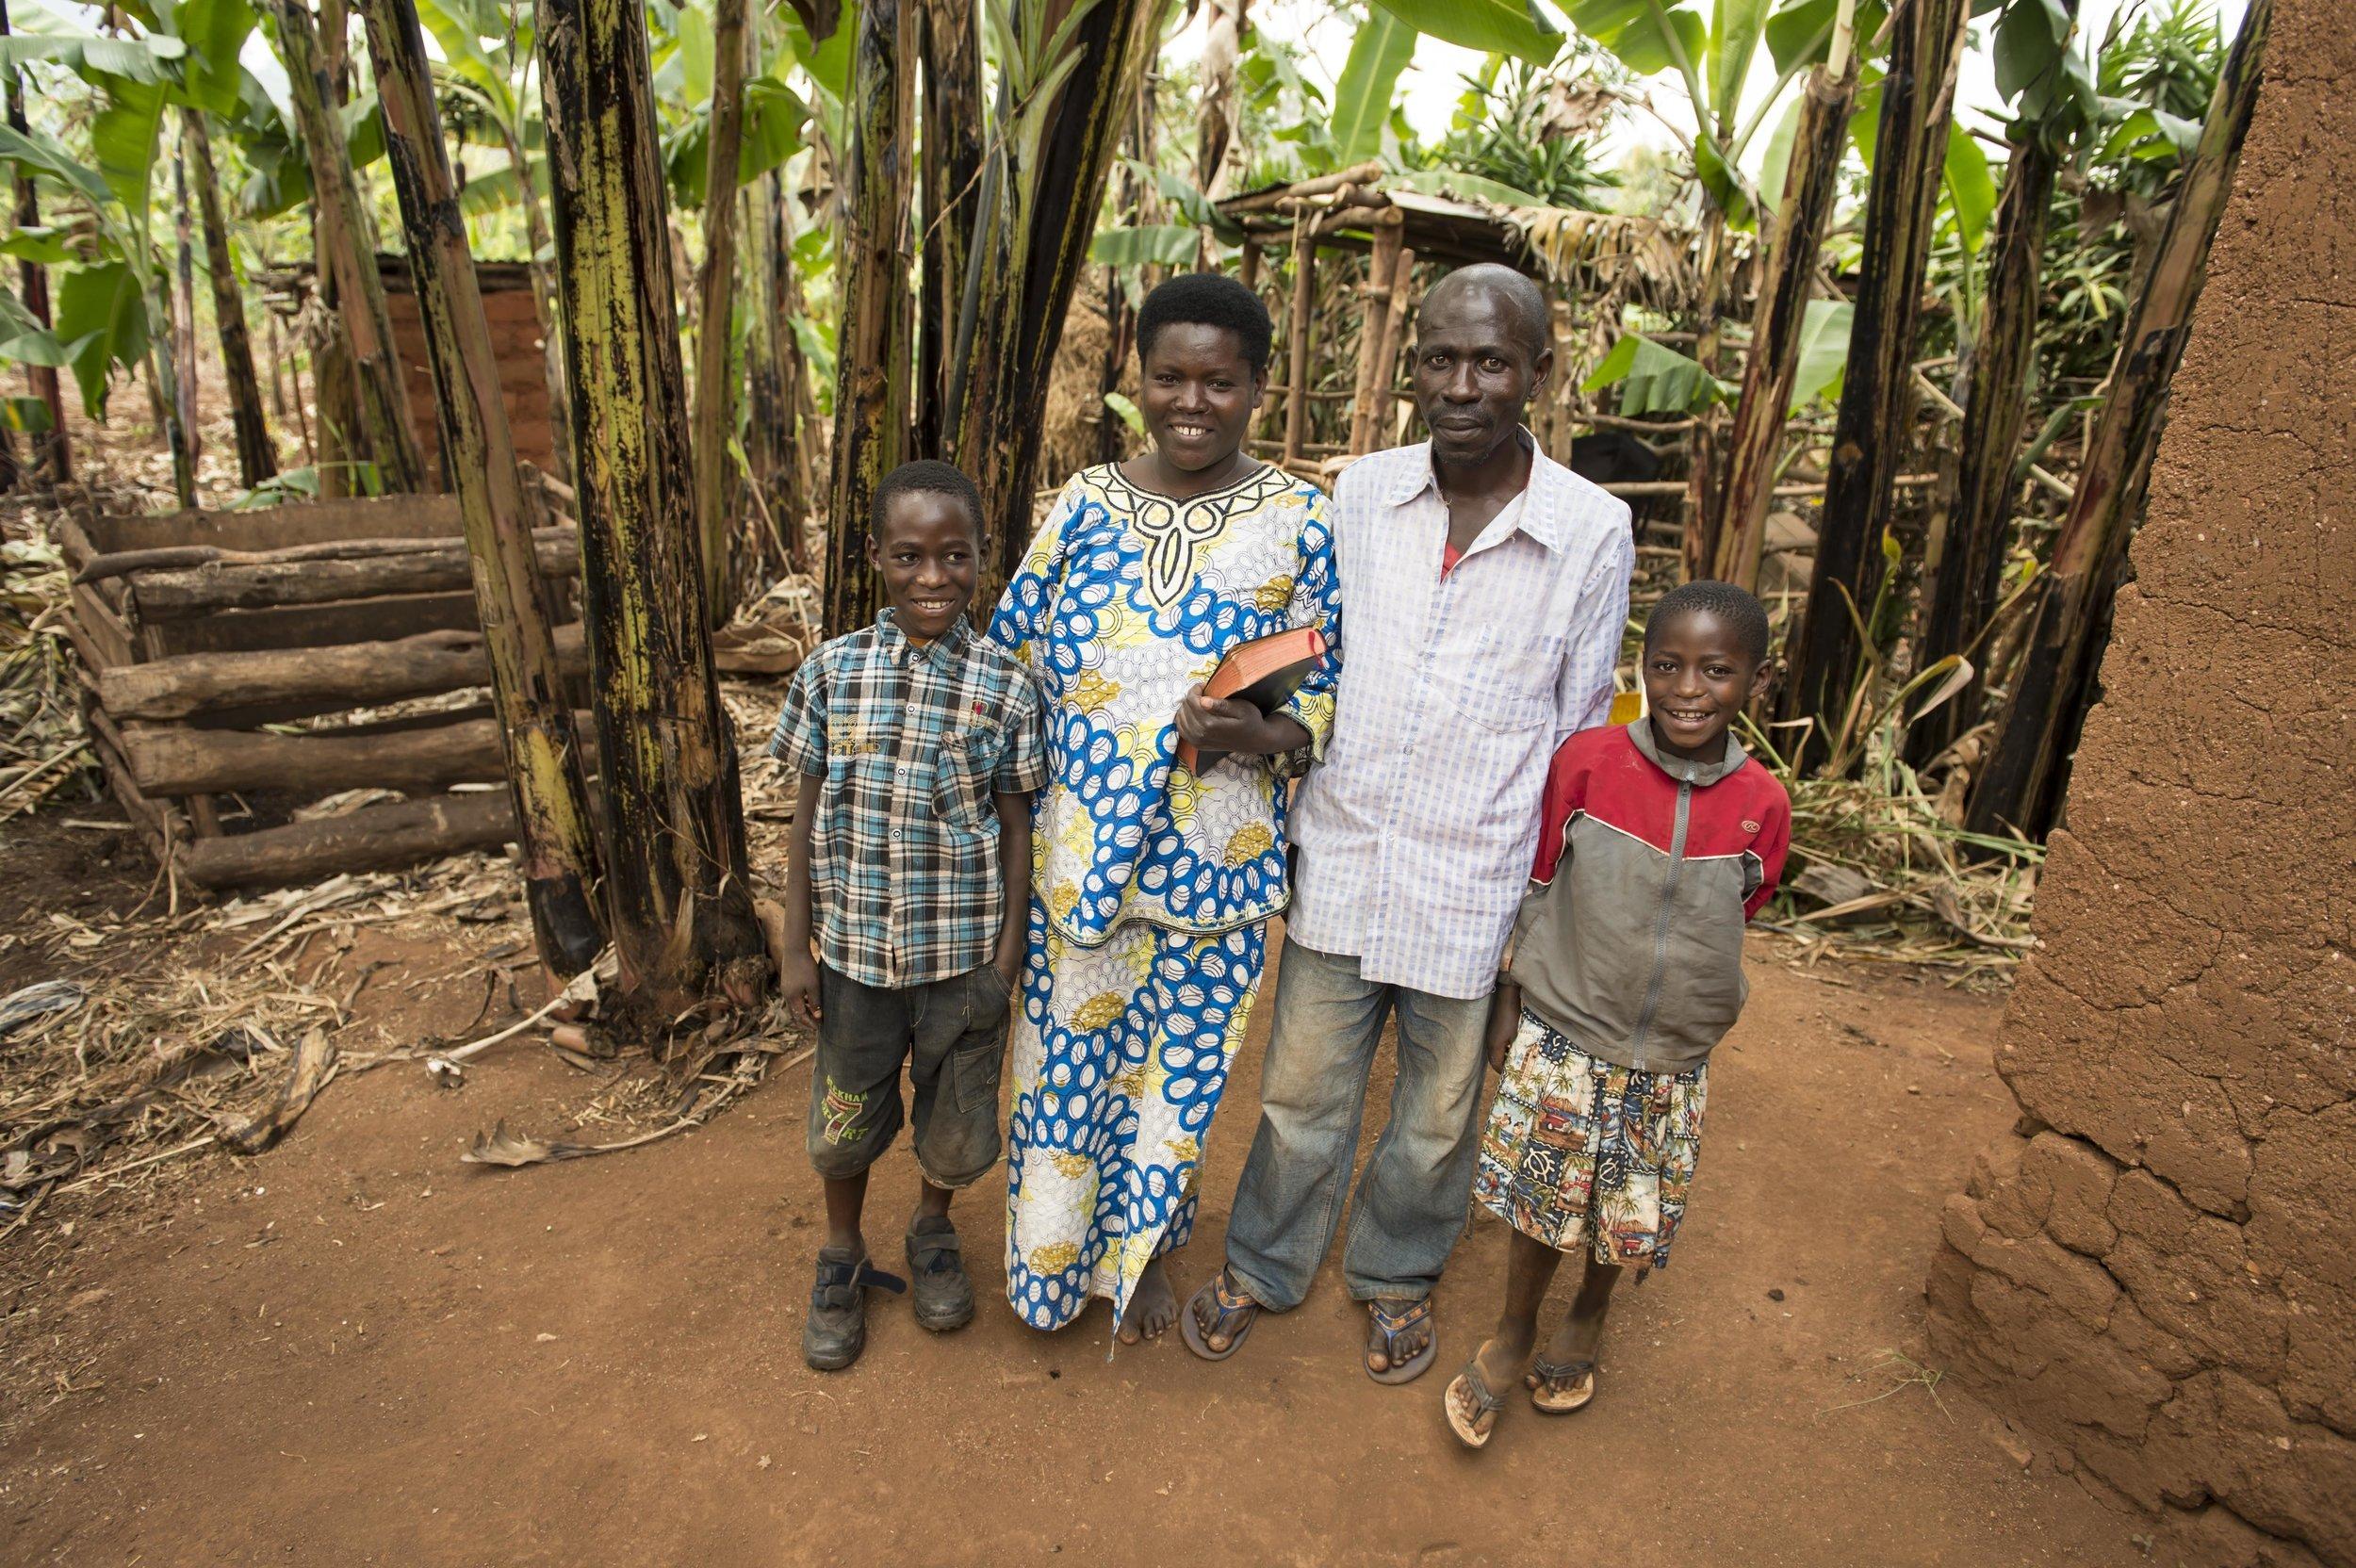 Burundi_4951.jpg